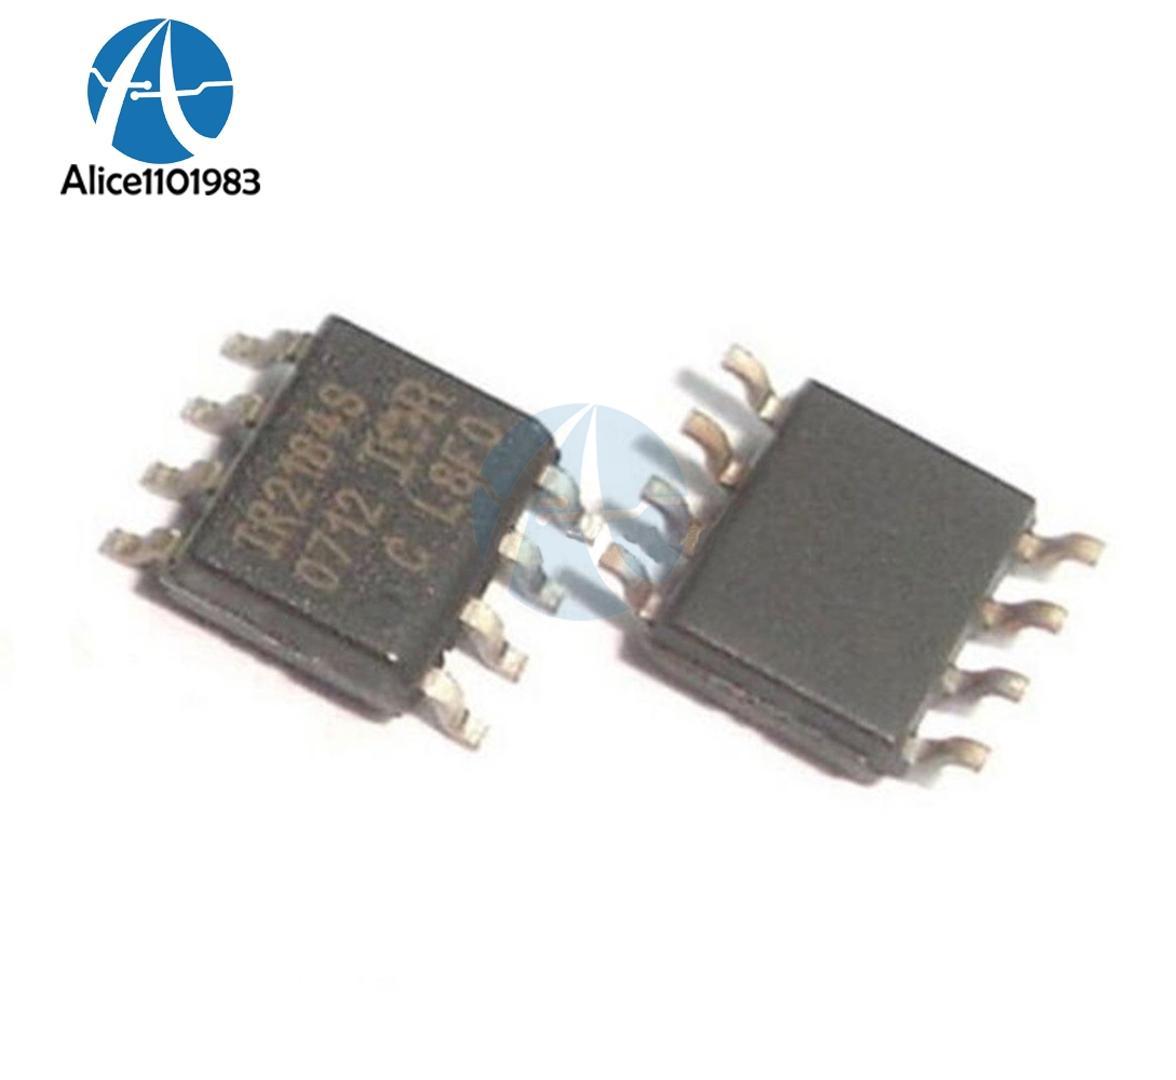 Conector GSP311 Macho Enchufe DIN 43650 A PIN43+1 IP65 400 V 16 A 931297001GSP311